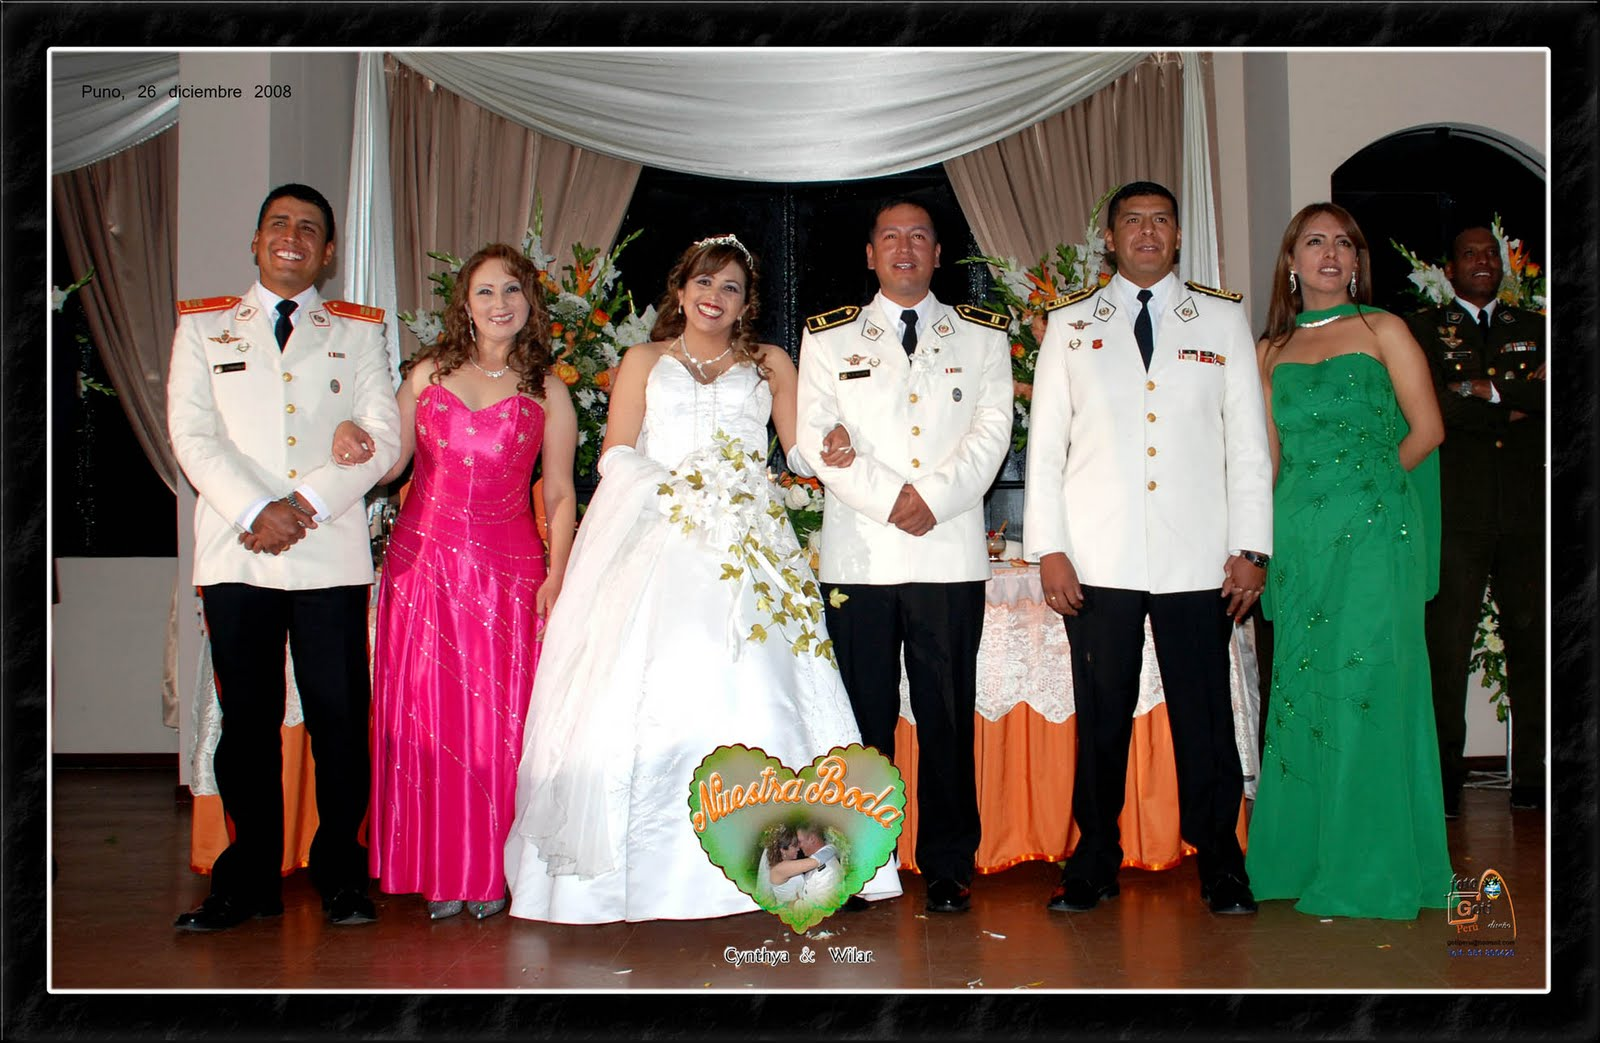 Matrimonio Simbolico En Peru : Gotardo bernedo catari bodas en el perÚ